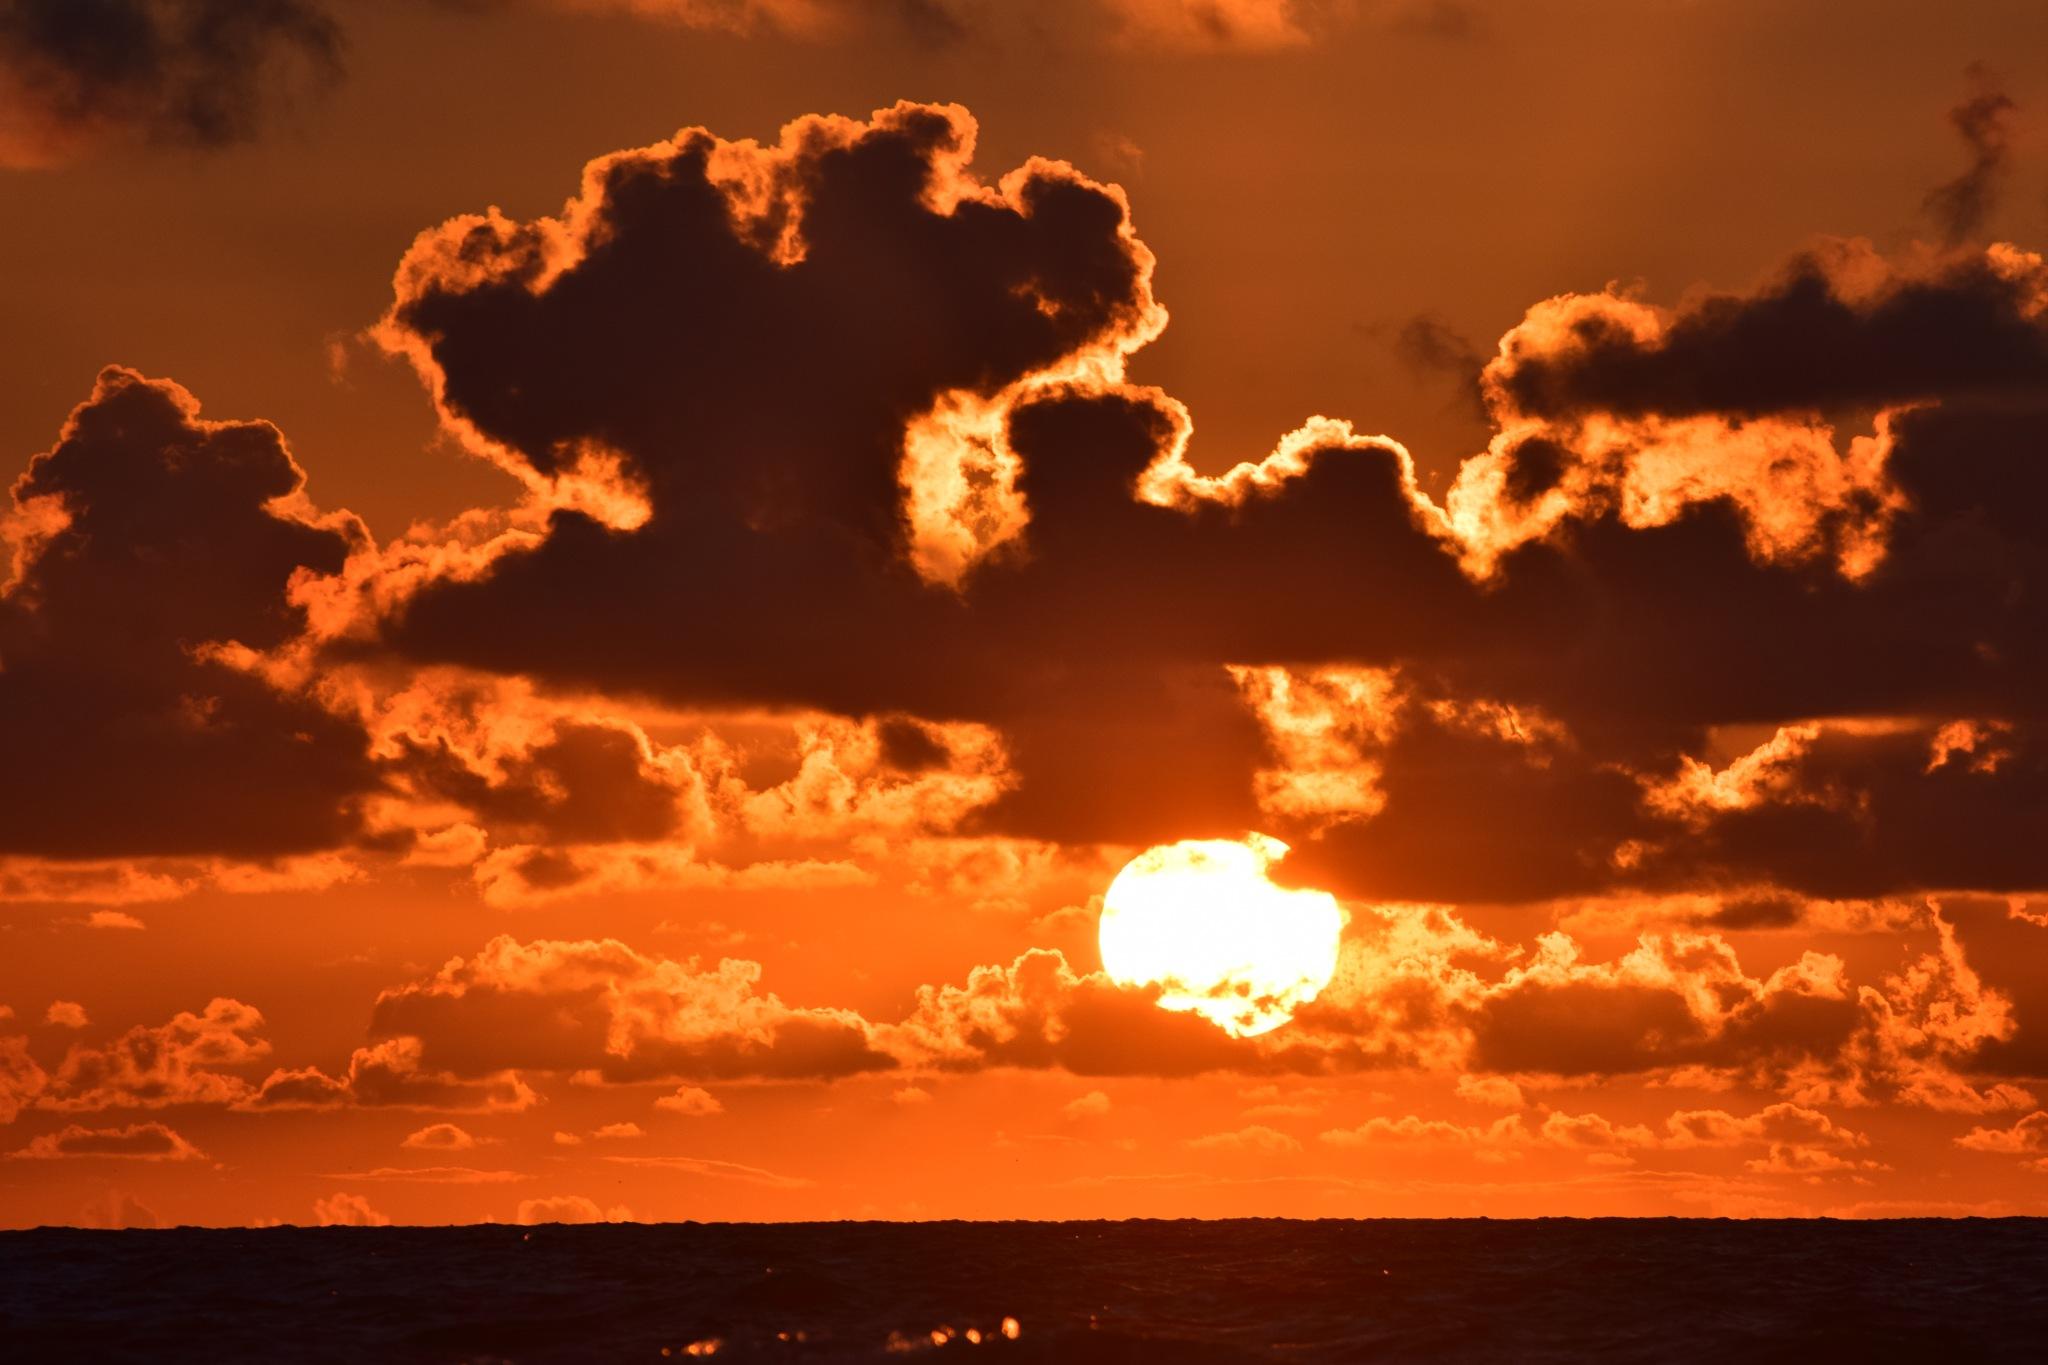 Galveston 211~The Firey Golden Sun by Lawrence Scott Hess